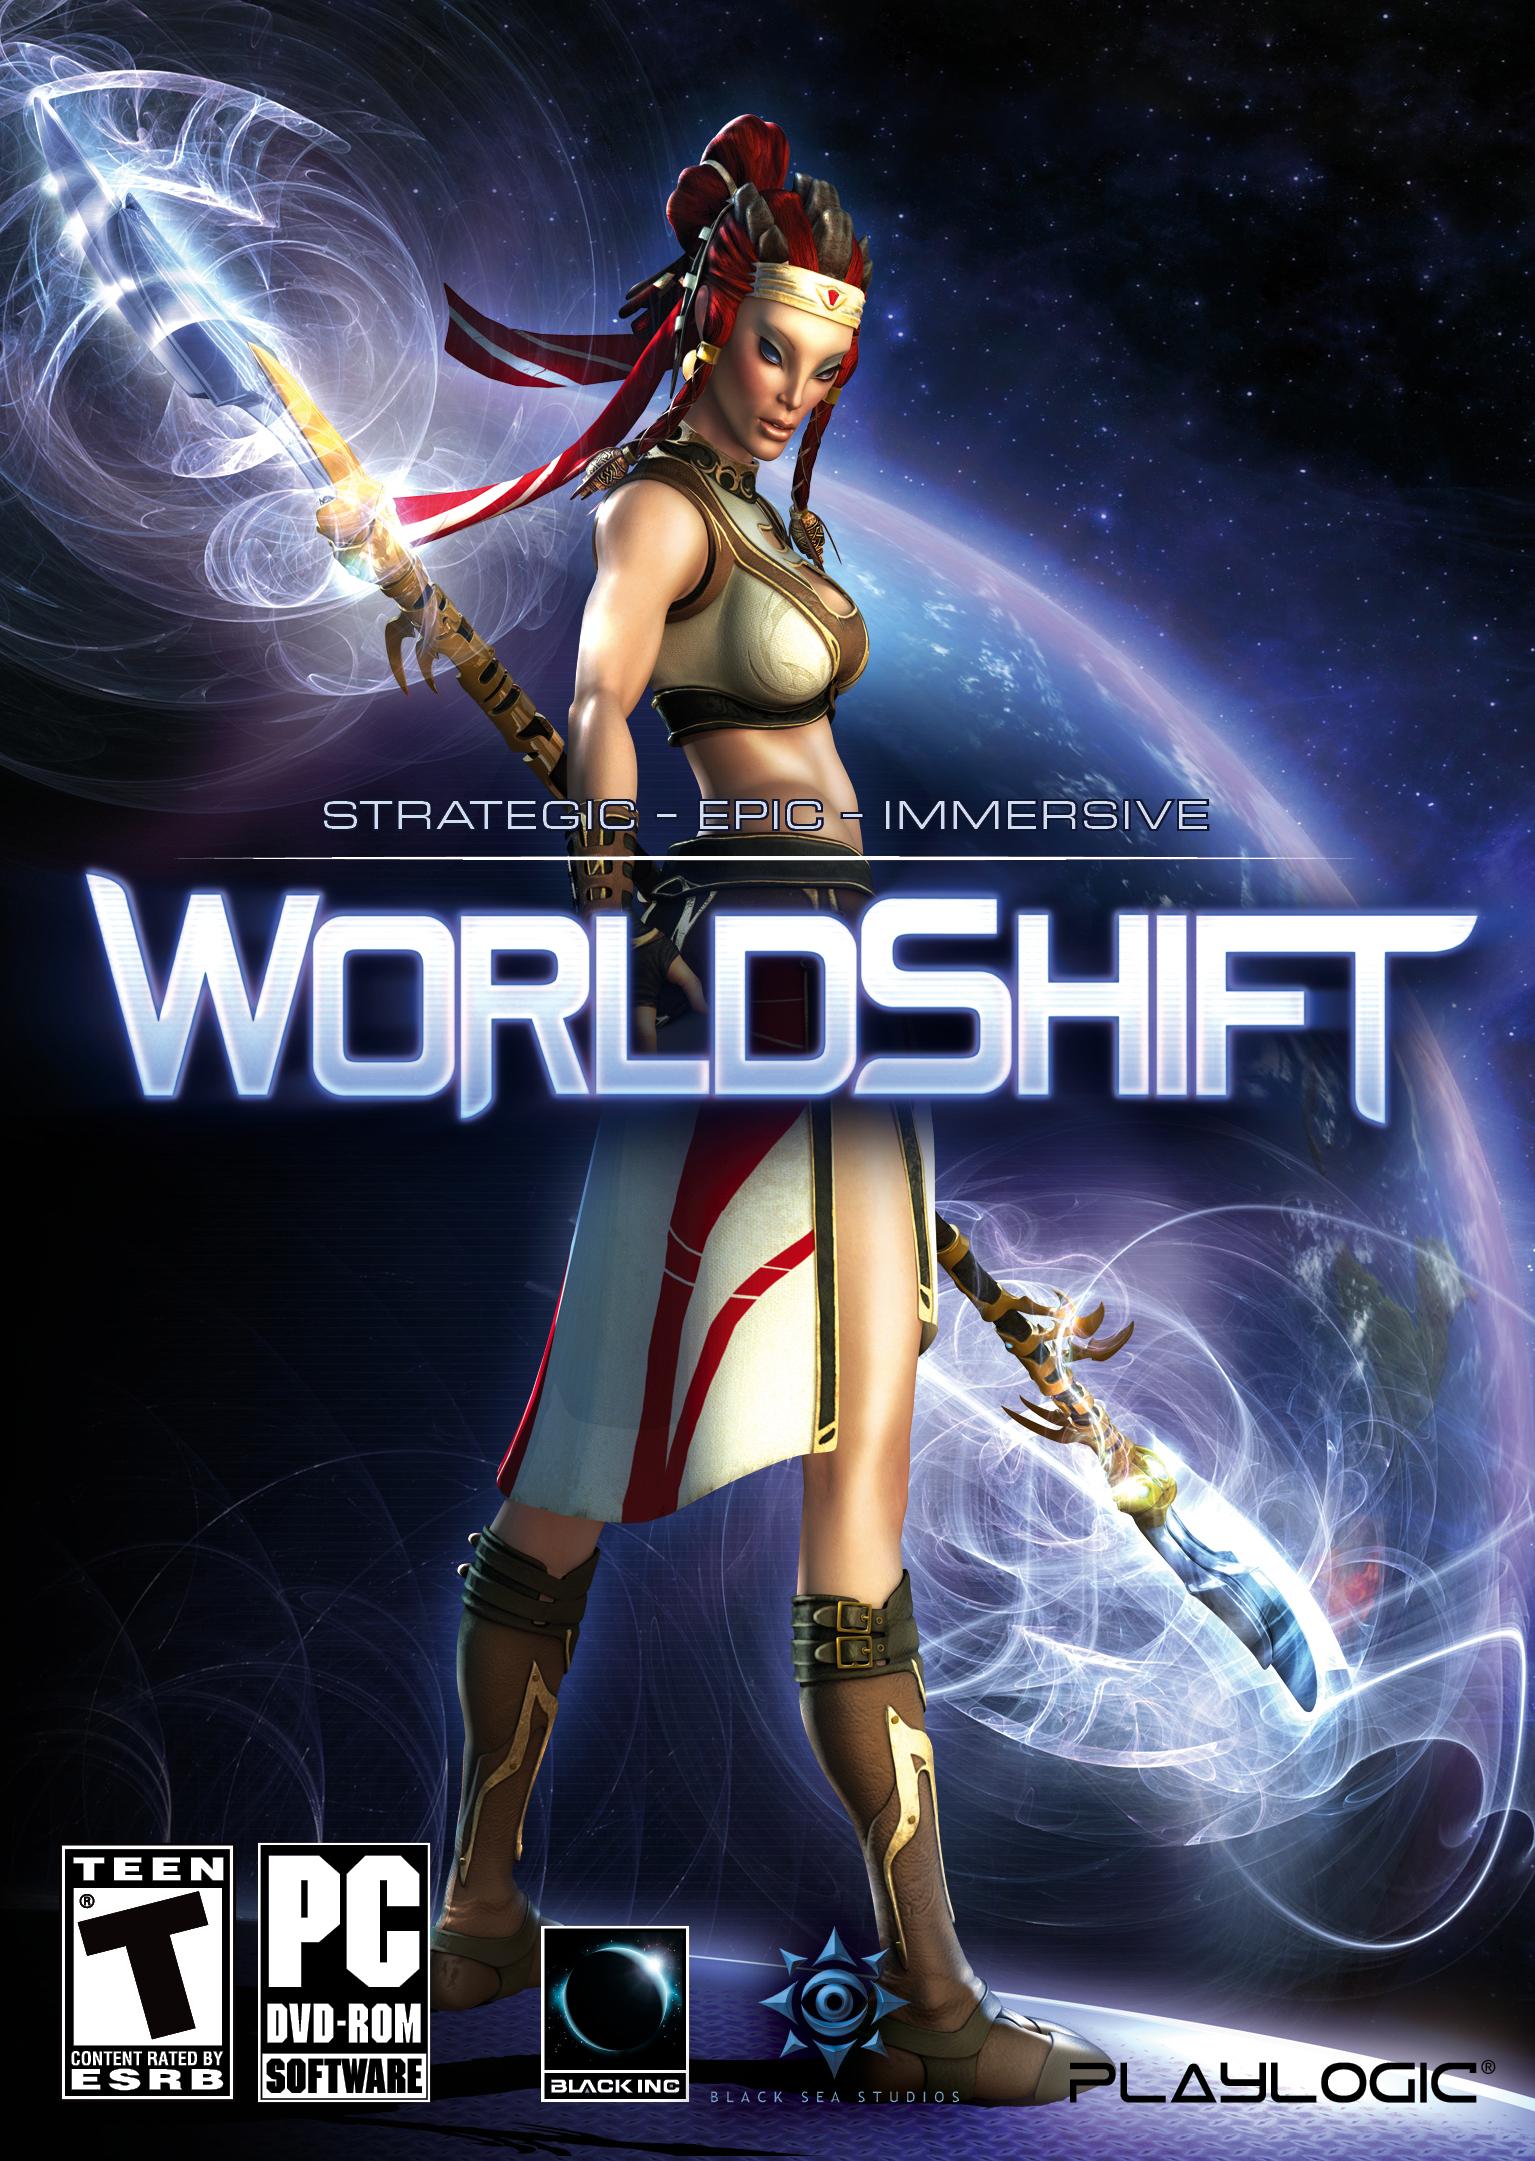 Файлы / Патч WorldShift v1.0.21 RU / PlayGround.ru.